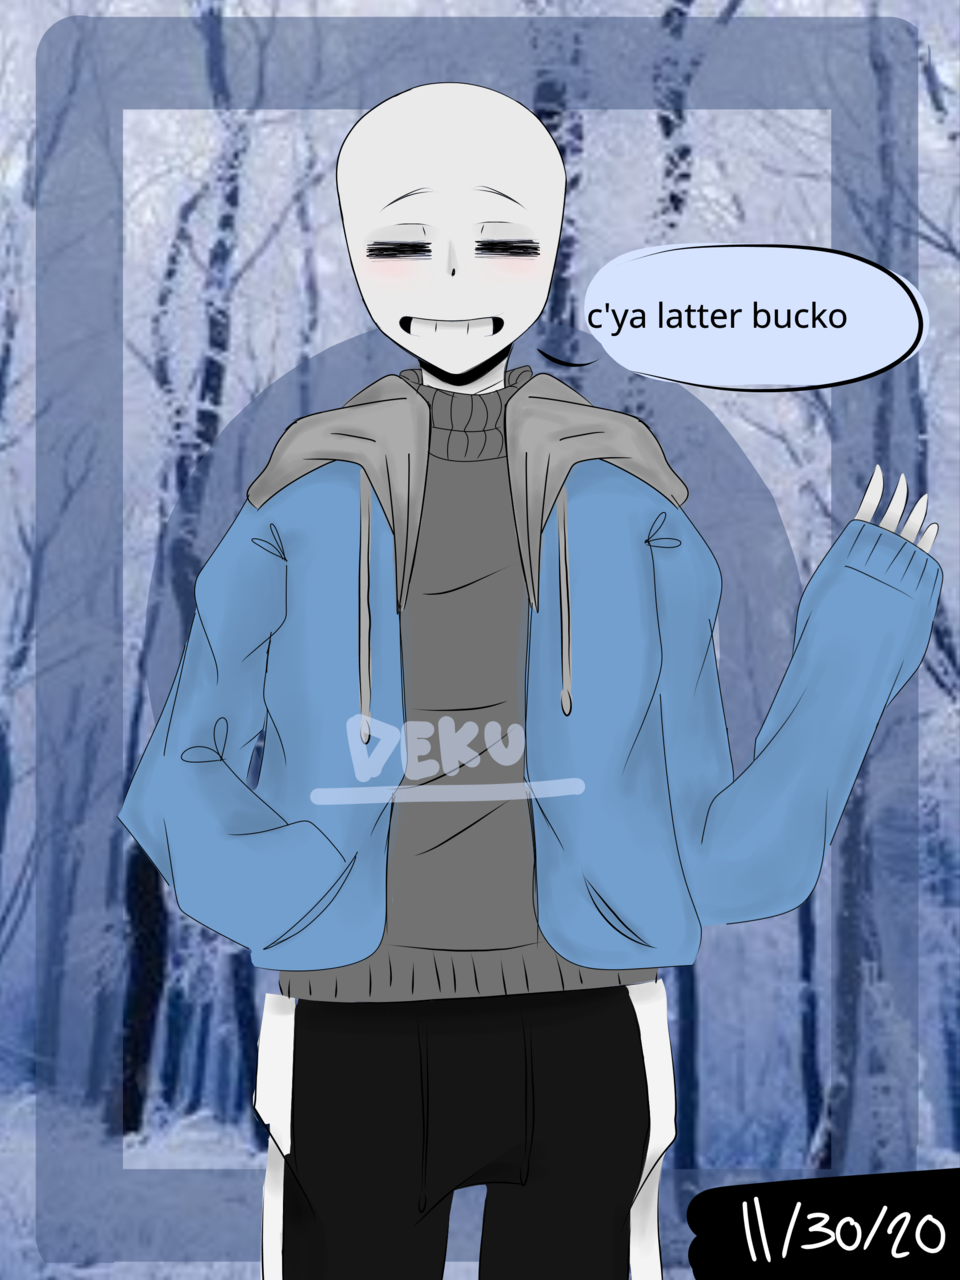 Sans says bye | plz read desc qwq Illust of Dekuchan_336(crazy mode?) medibangpaint Sans anime byebye SansTheSkeleton Seeyoulater nwn